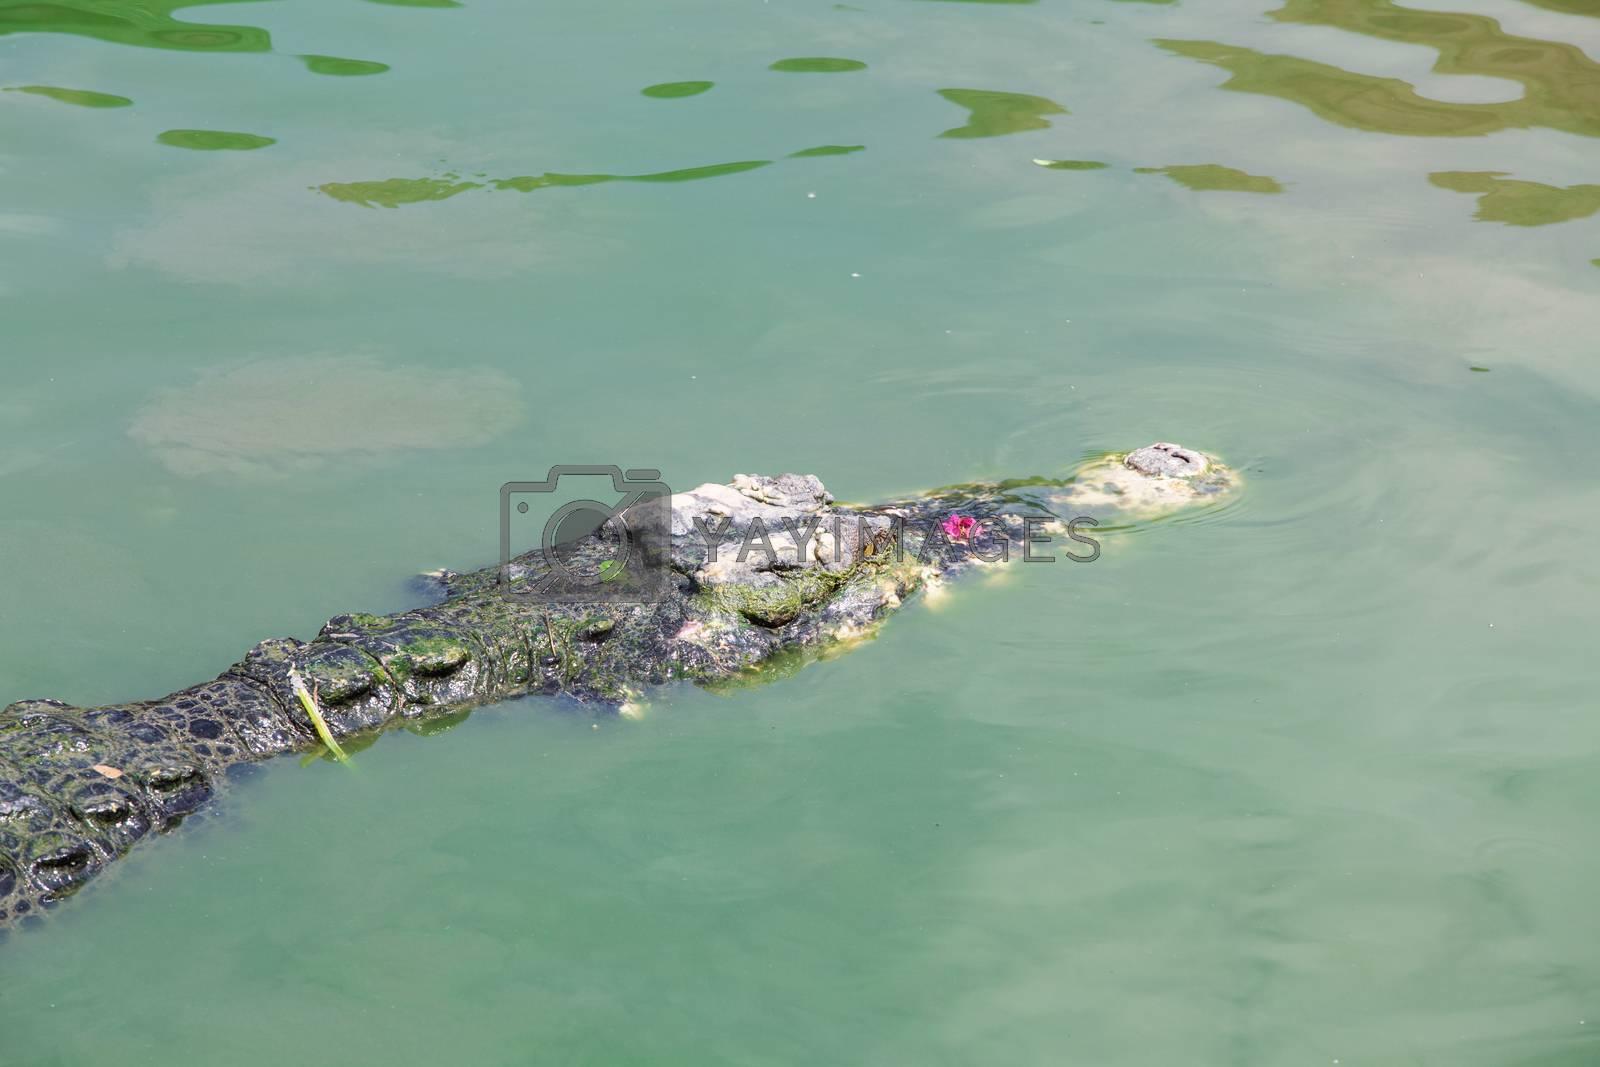 Royalty free image of crocodiles by tuchkay